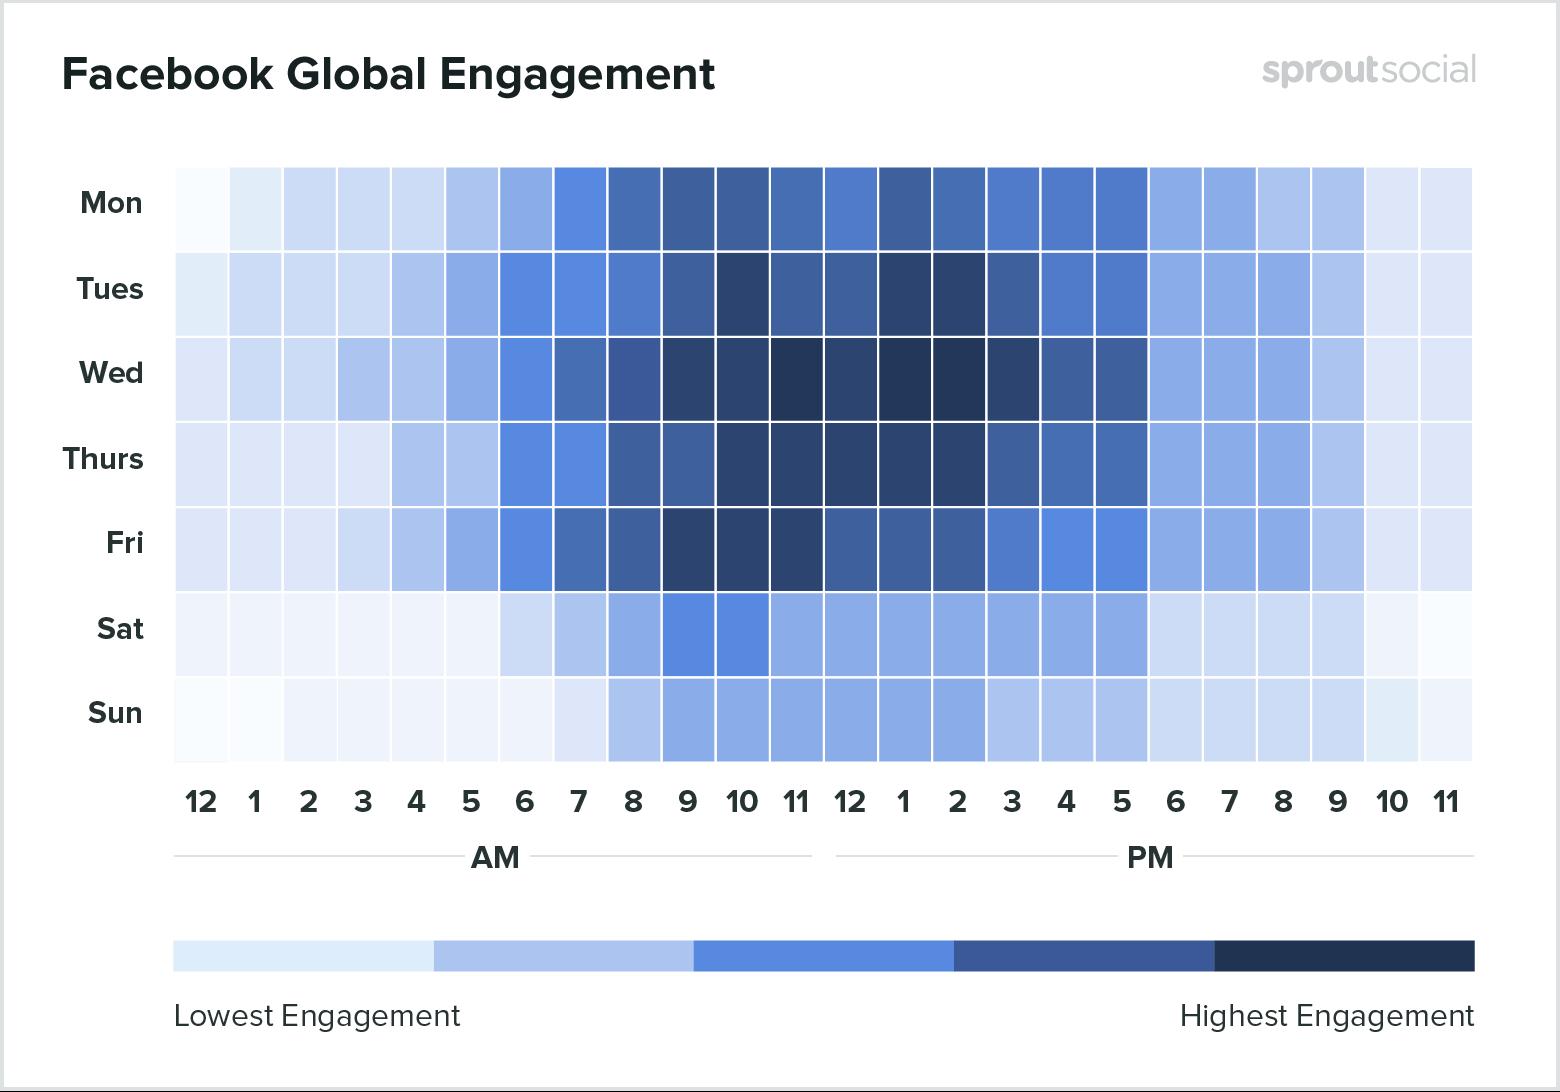 Facebook Global Engagement graph.